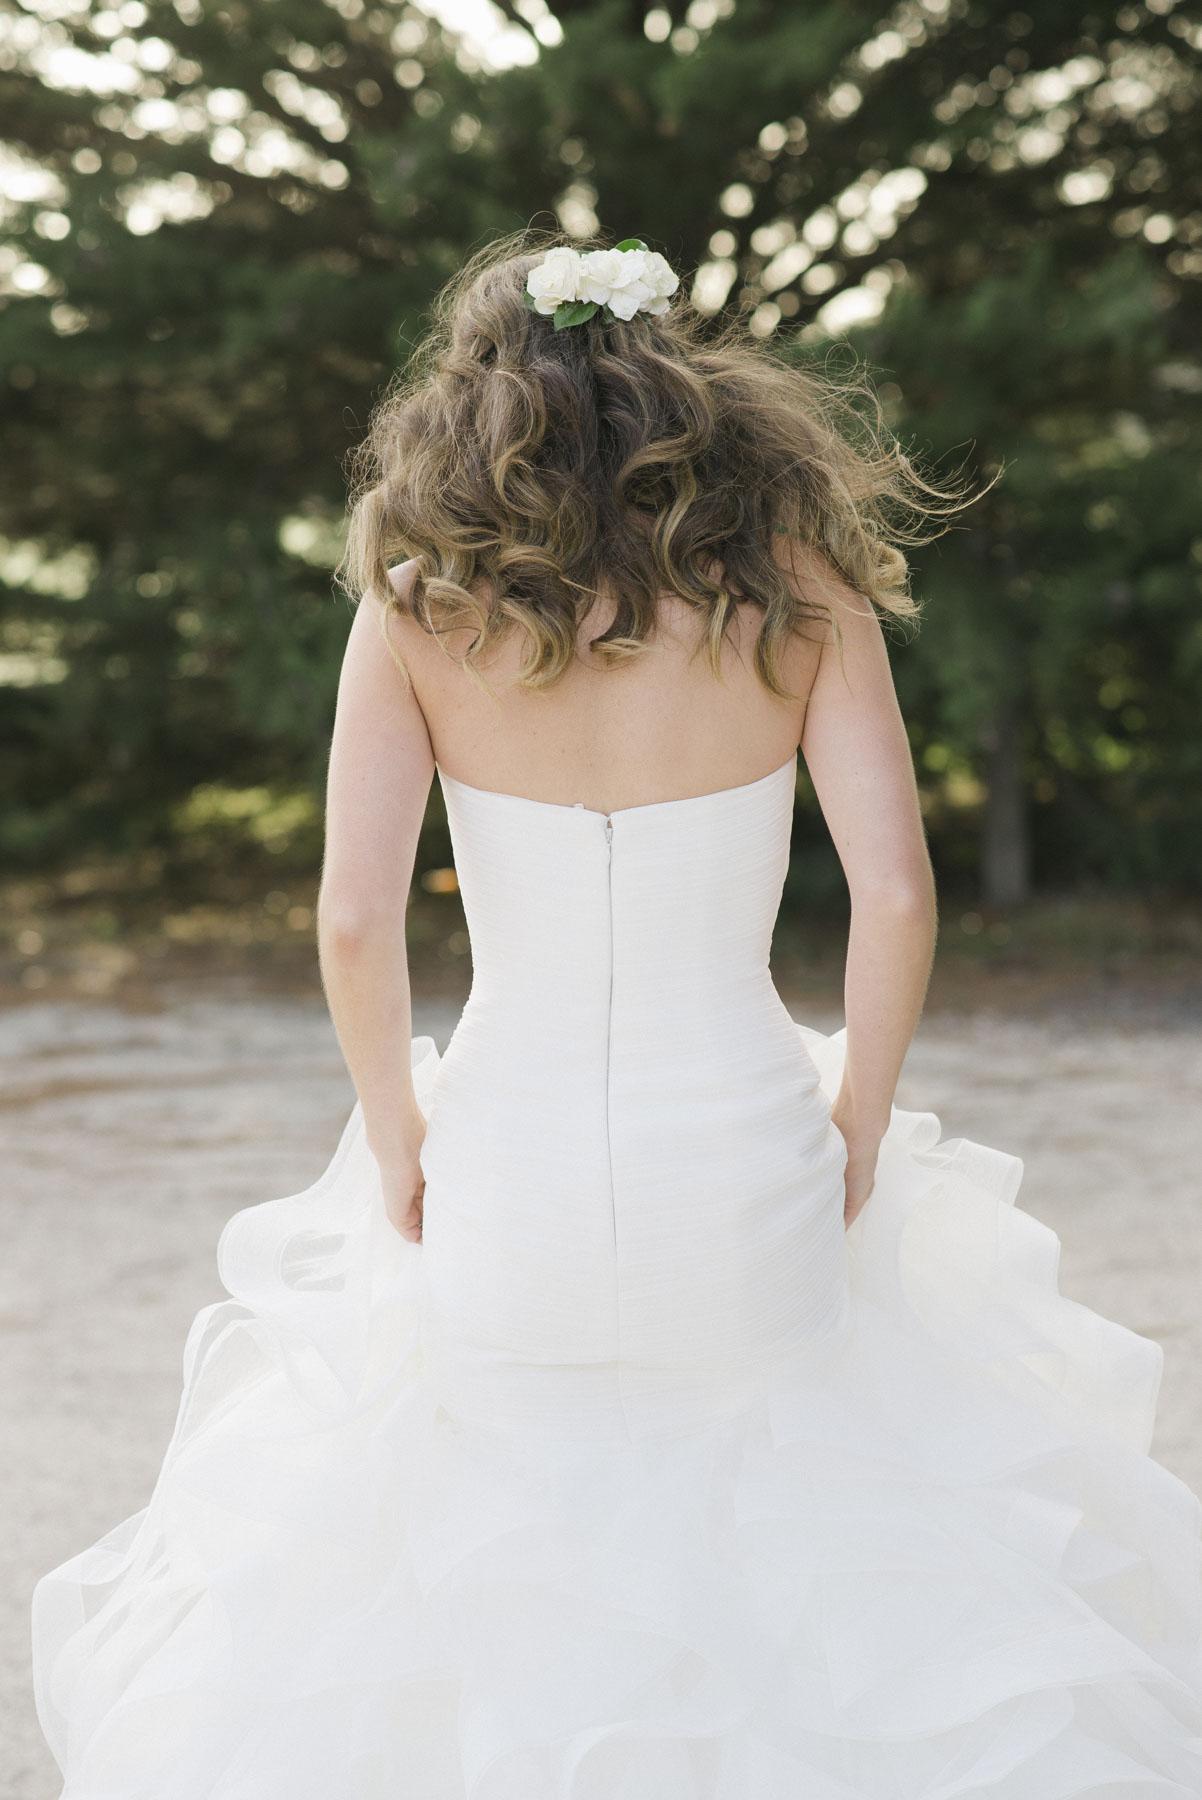 1501vand-350alan_moyle_wedding_portrait_brighton_bayside_werribee_estate_mansion_zoo_rustic_styled_garden_mansion_candid_documentry_victoria_whitelaw.jpg